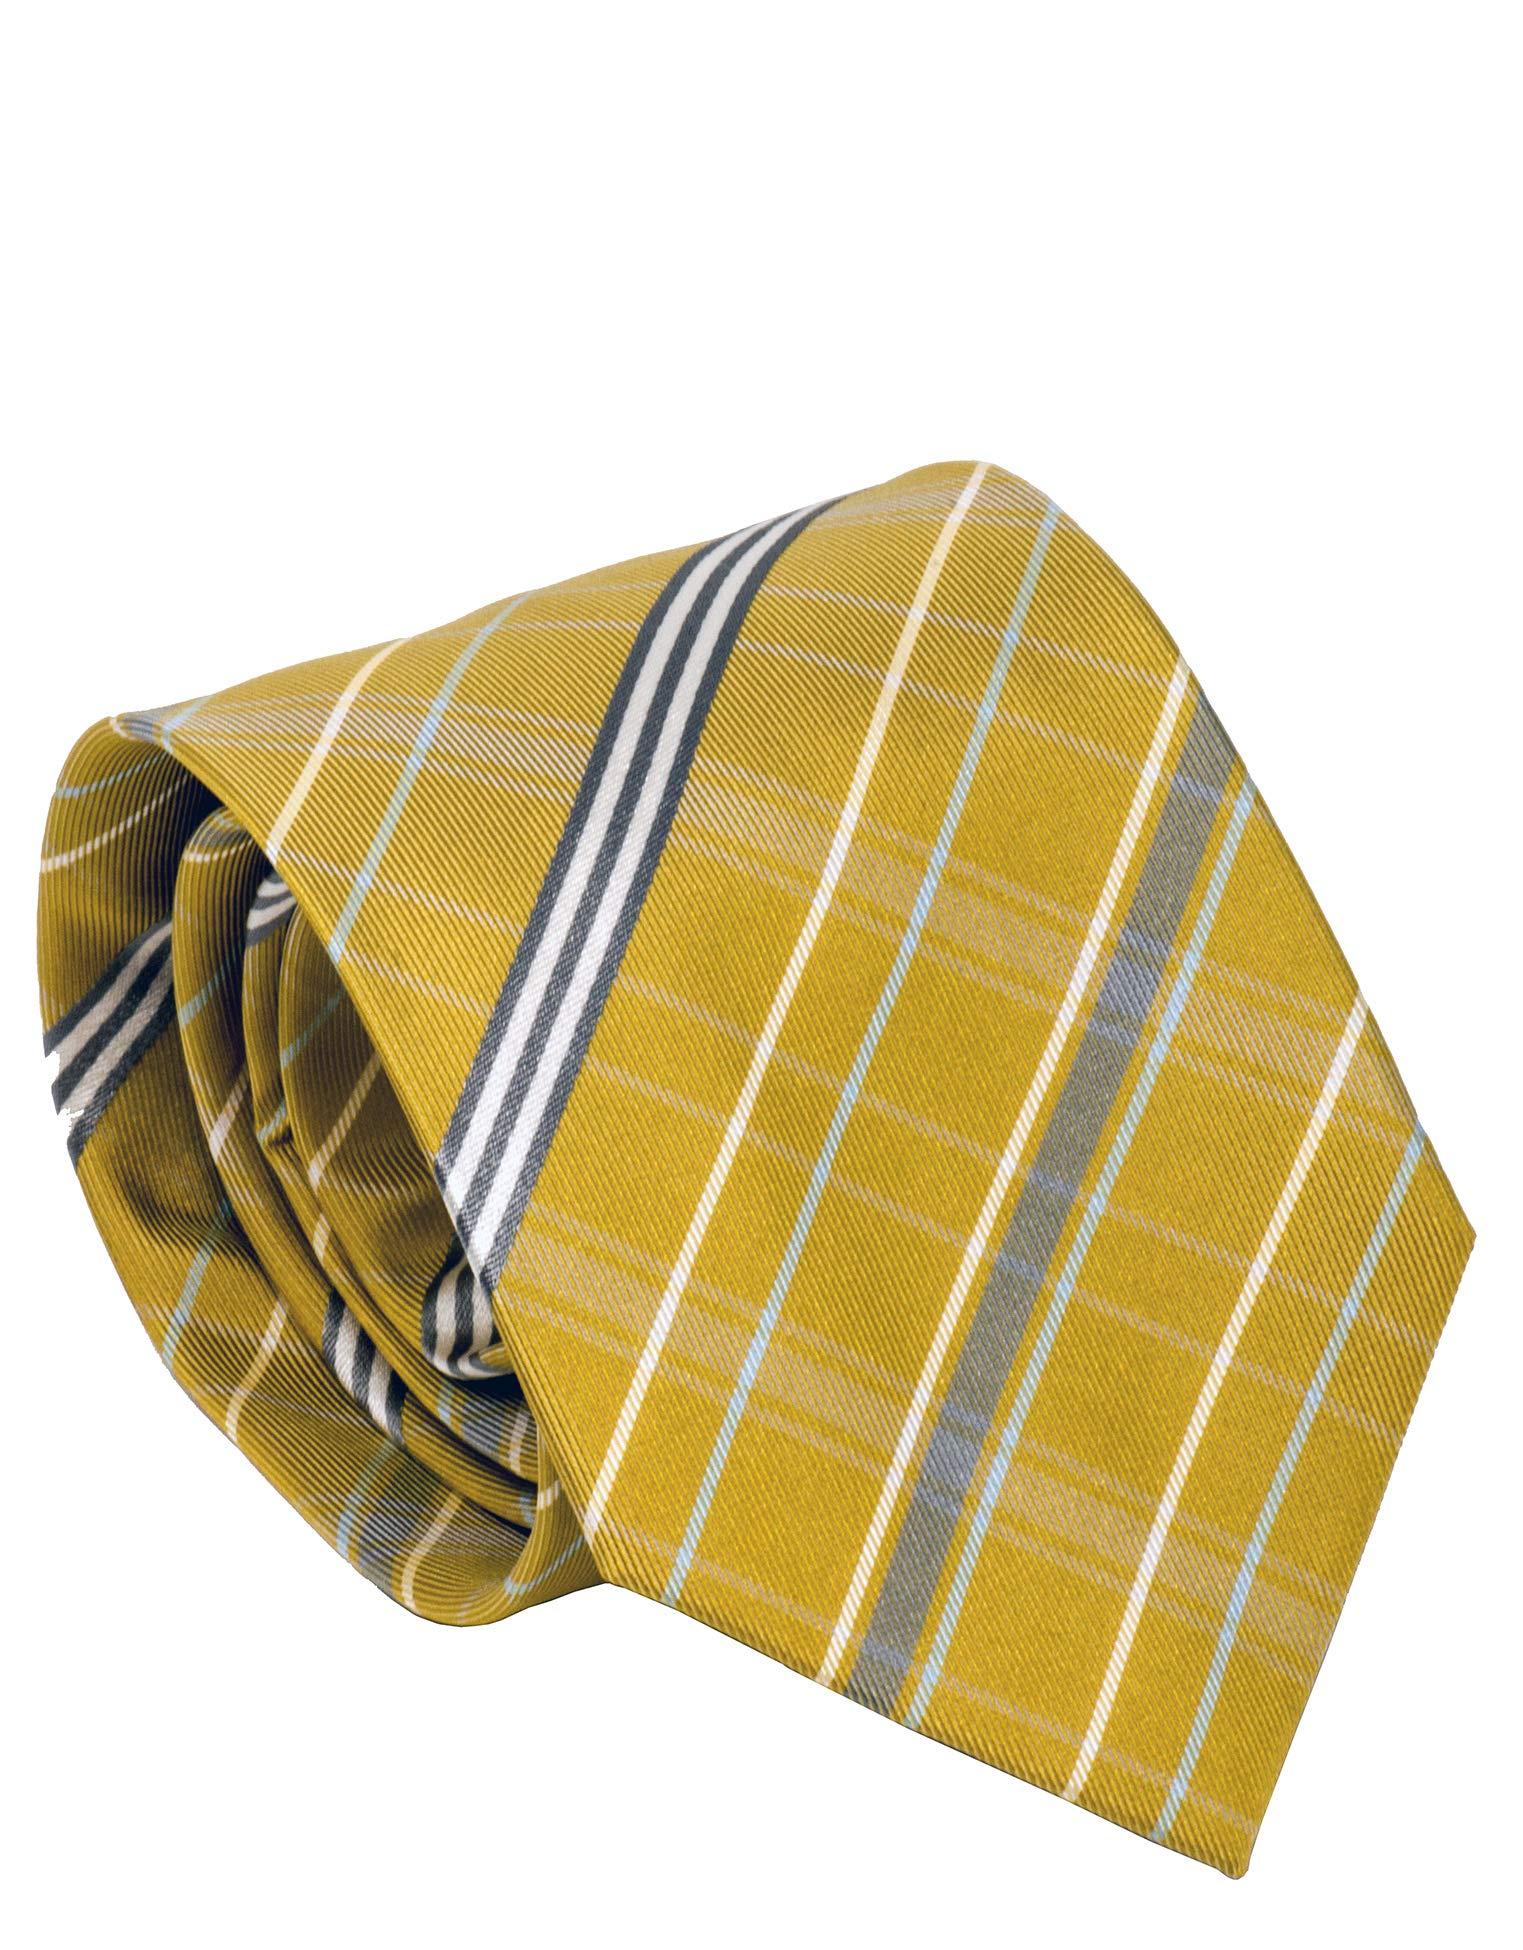 Burberry London Mens Necktie Classic Diagonal Stripe Pattern Wide Cut Silk Tie (Yellow/Grey)